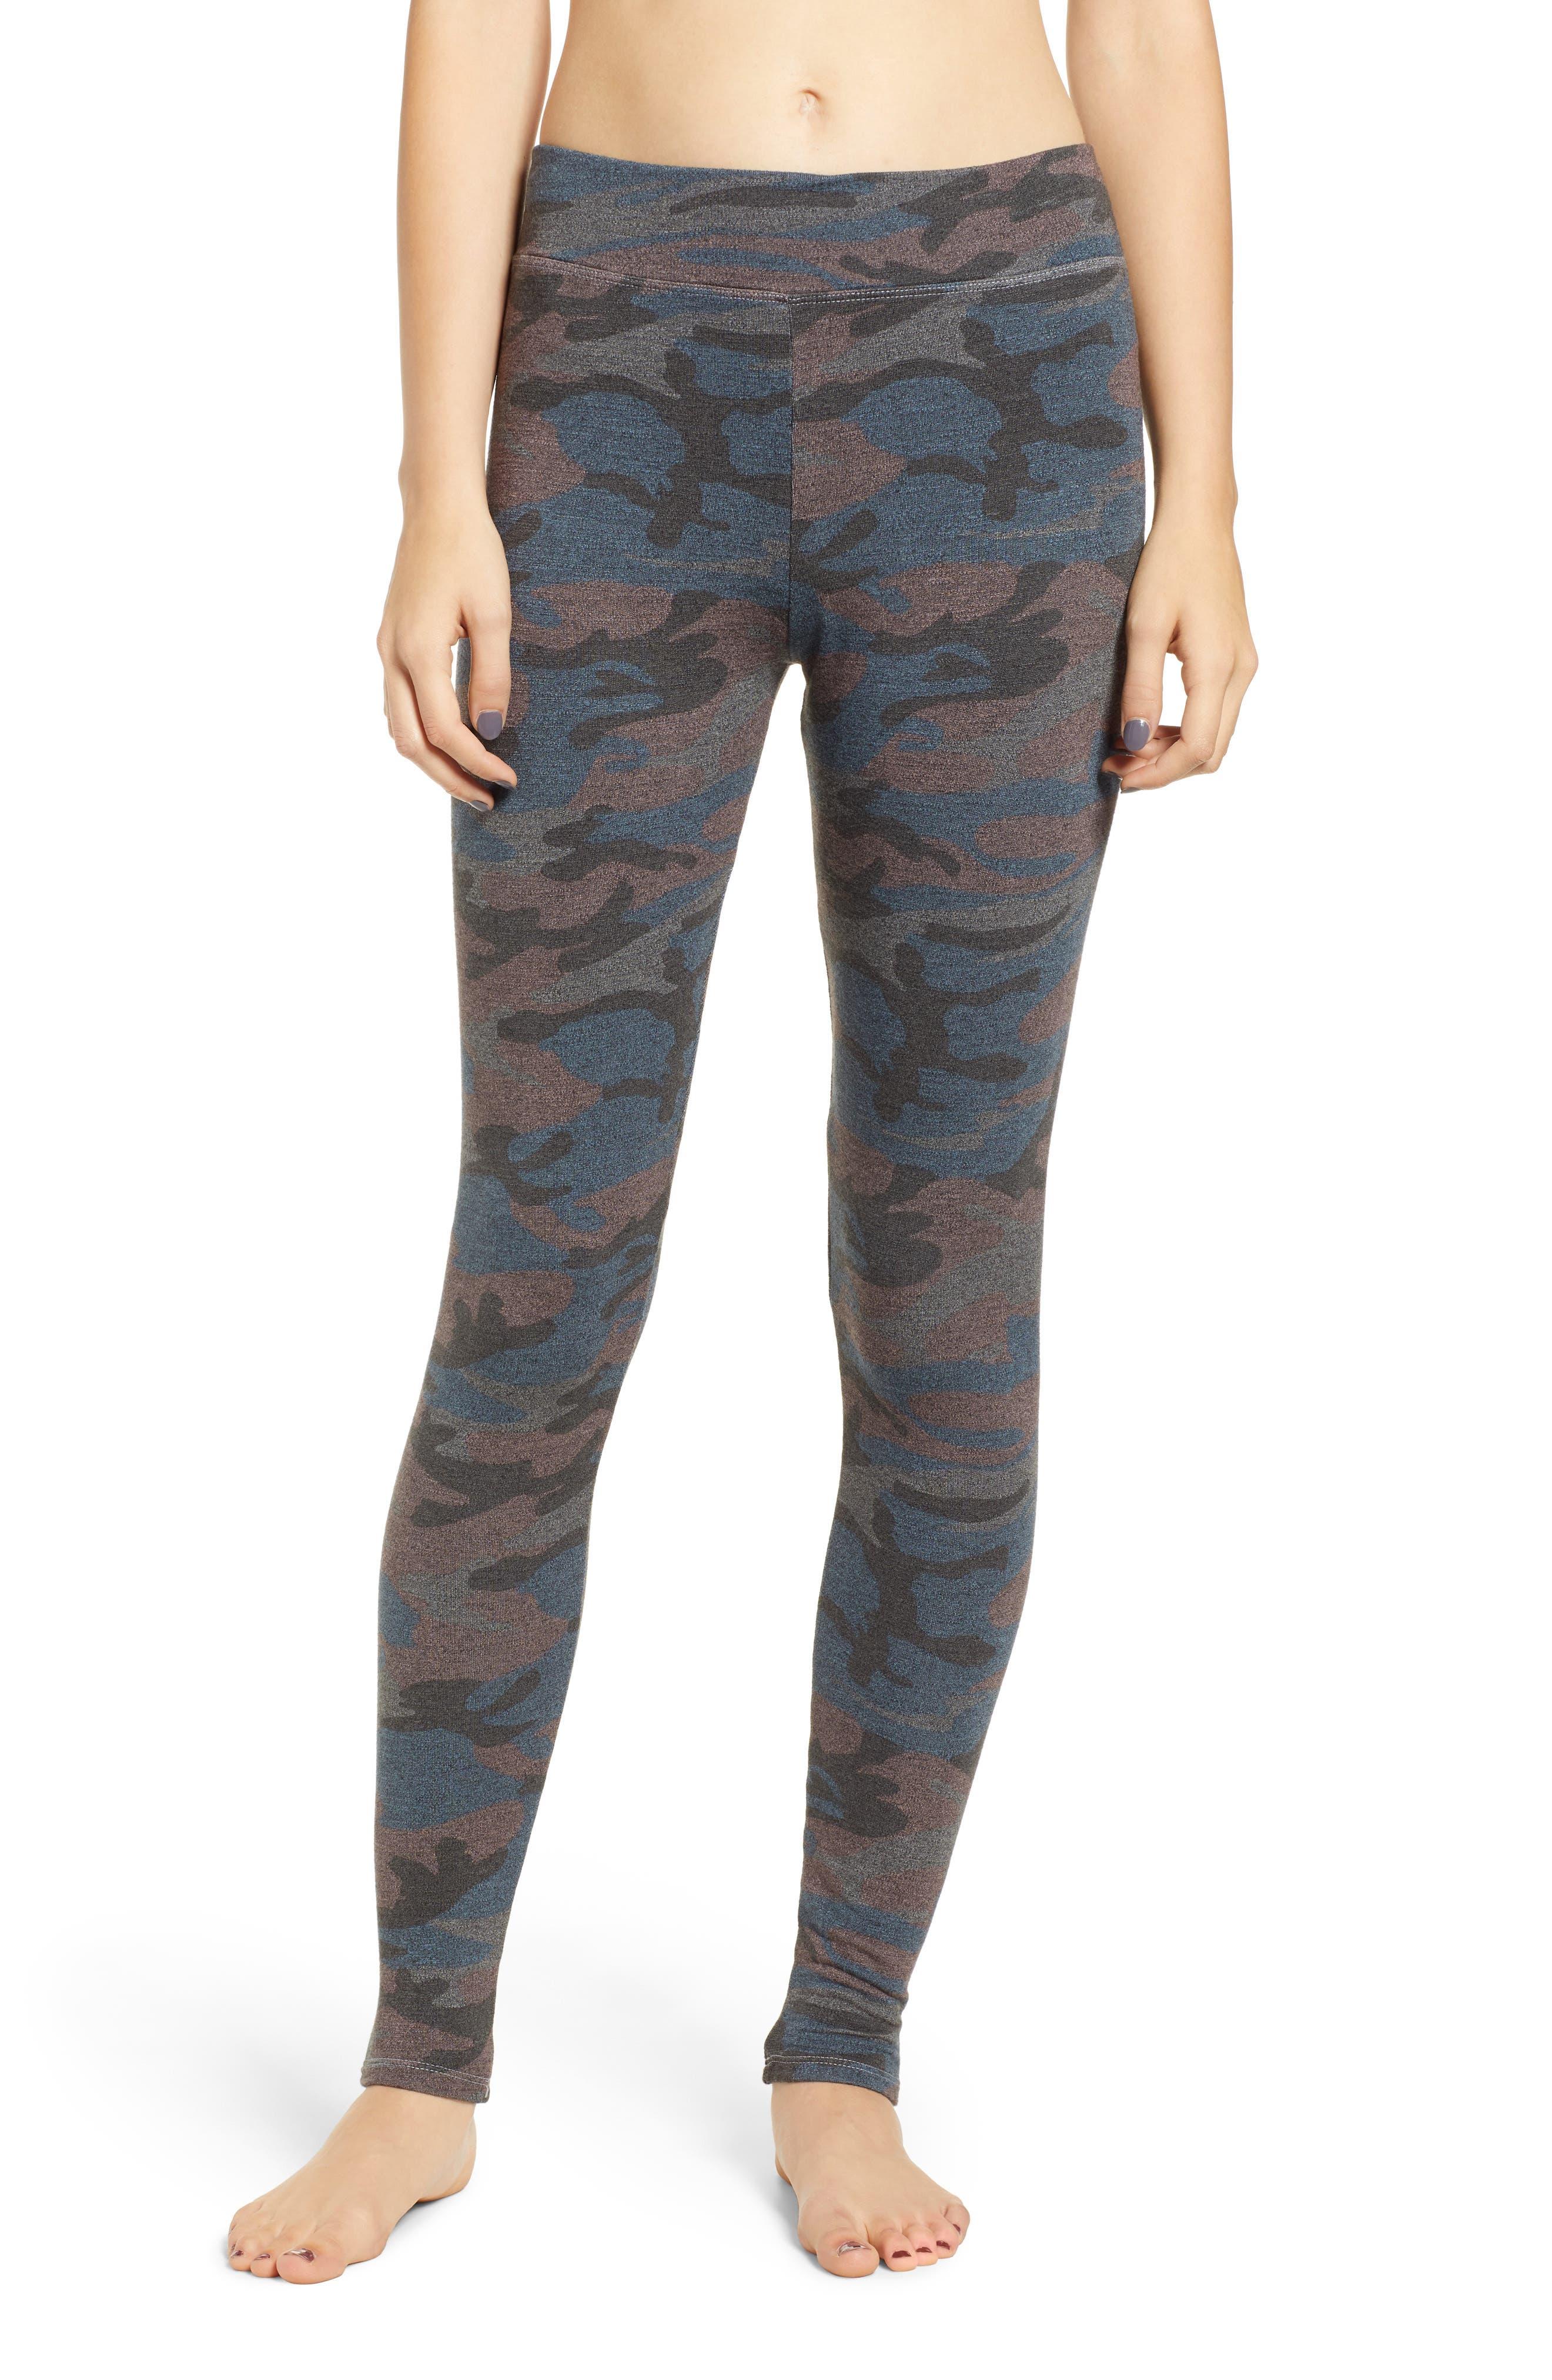 SUNDRY Camo Yoga Pants, Main, color, 020